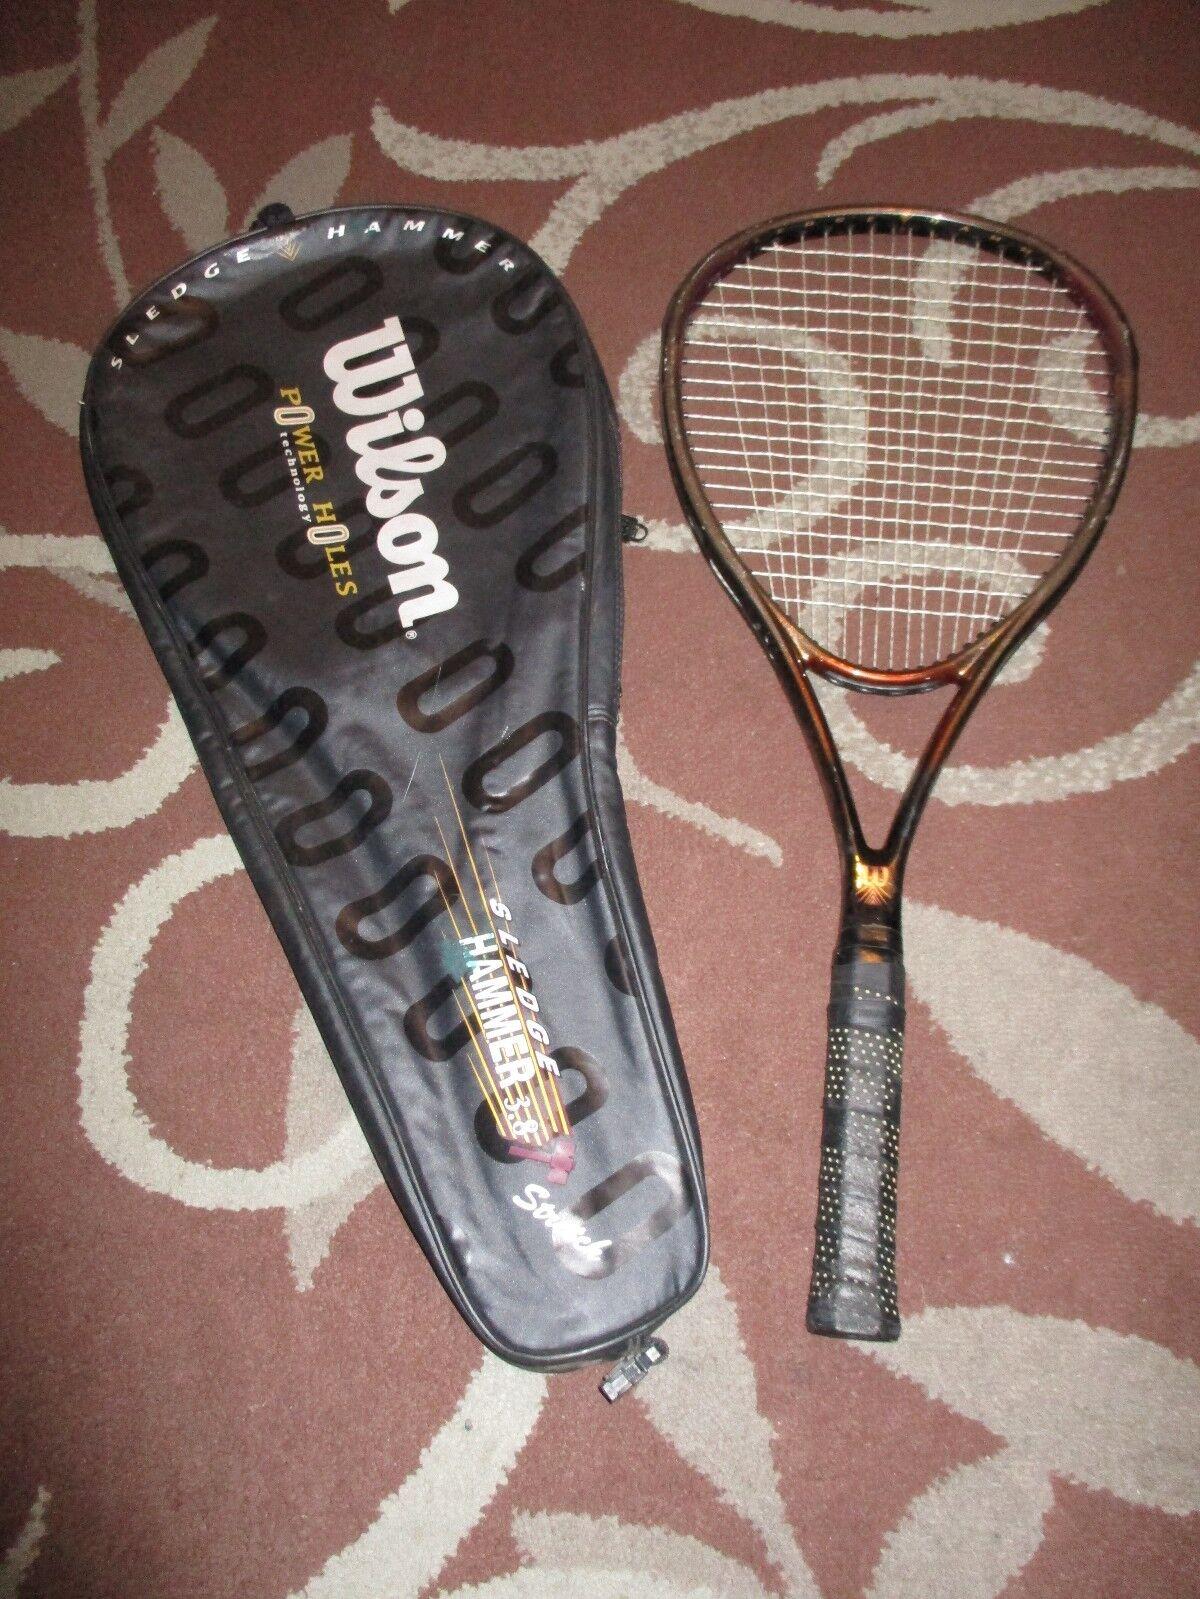 Martillo 2.8 Wilson Trineo Stretch OverTalla 116 4 1 4 Tenis Raqueta Agarre Con Bolsa De 4 3 8